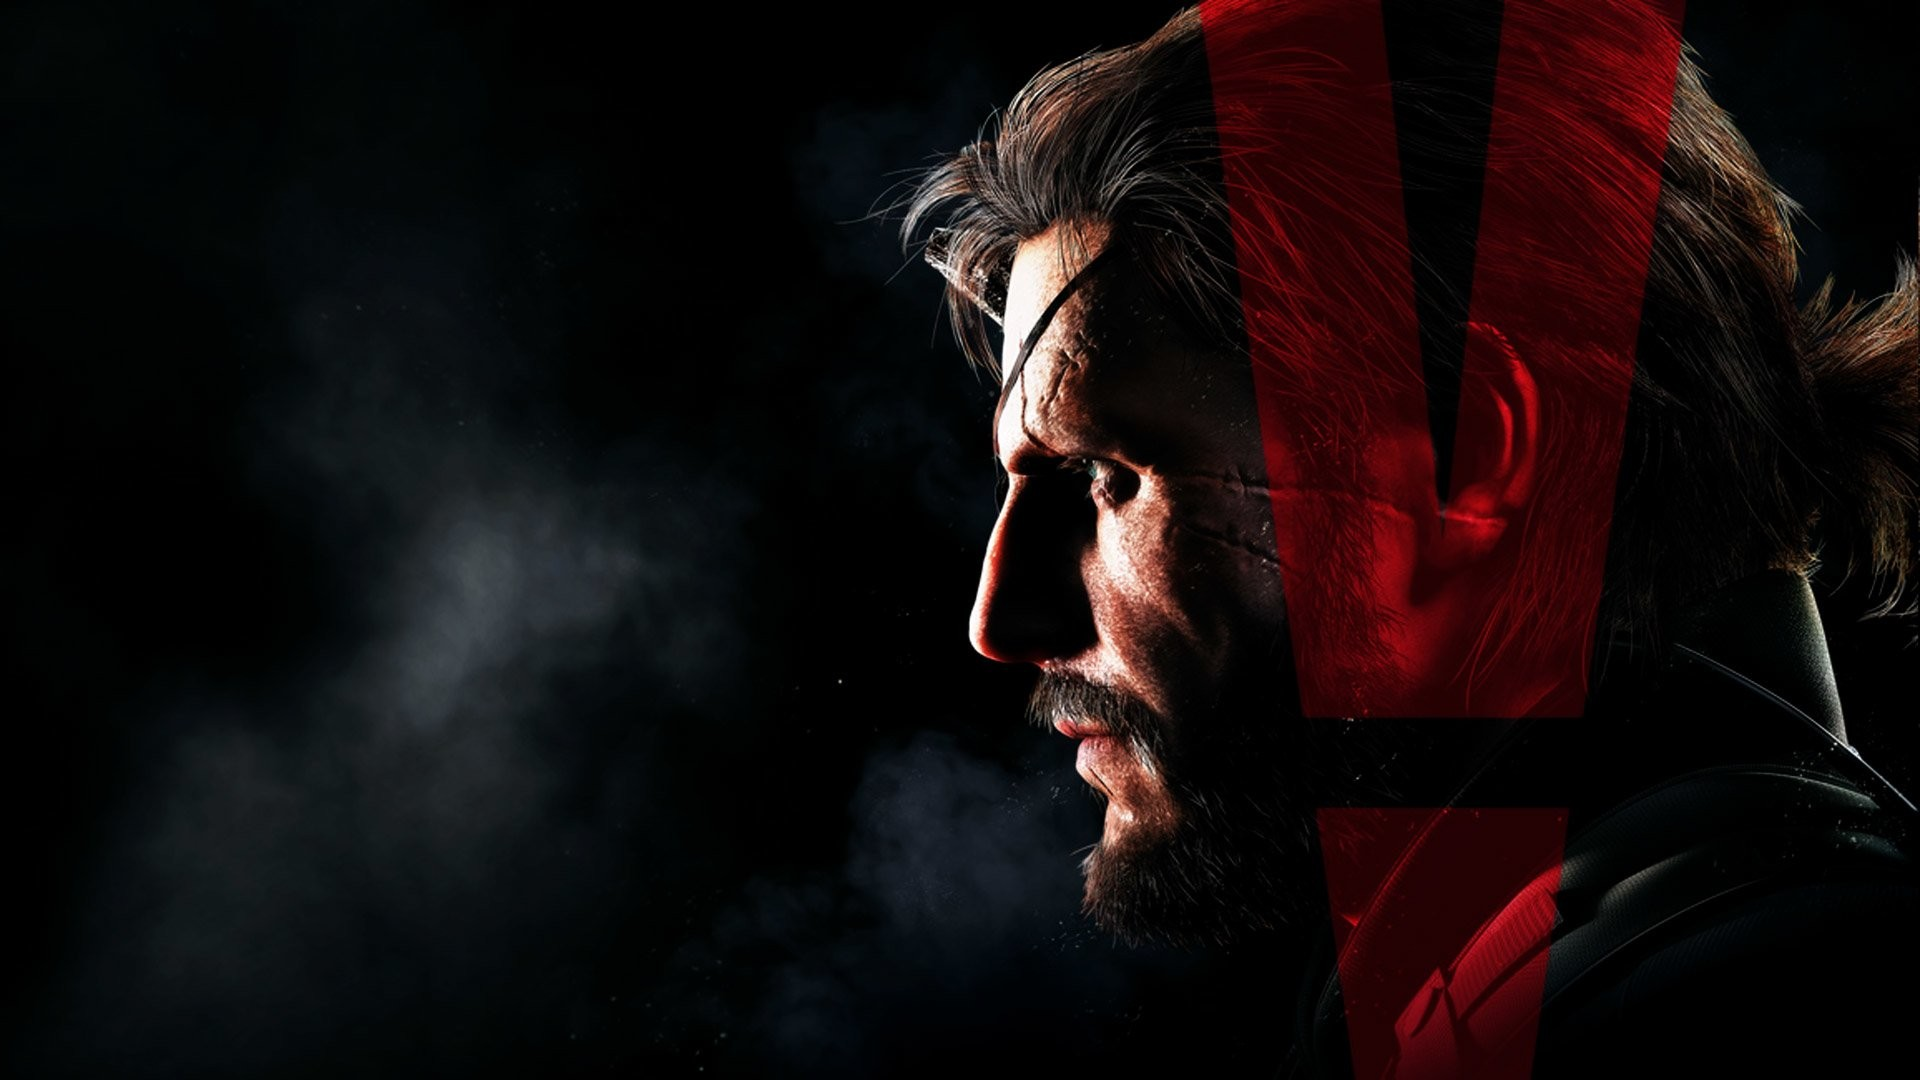 Metal Gear Solid wallpaper ·① Download free beautiful full ...